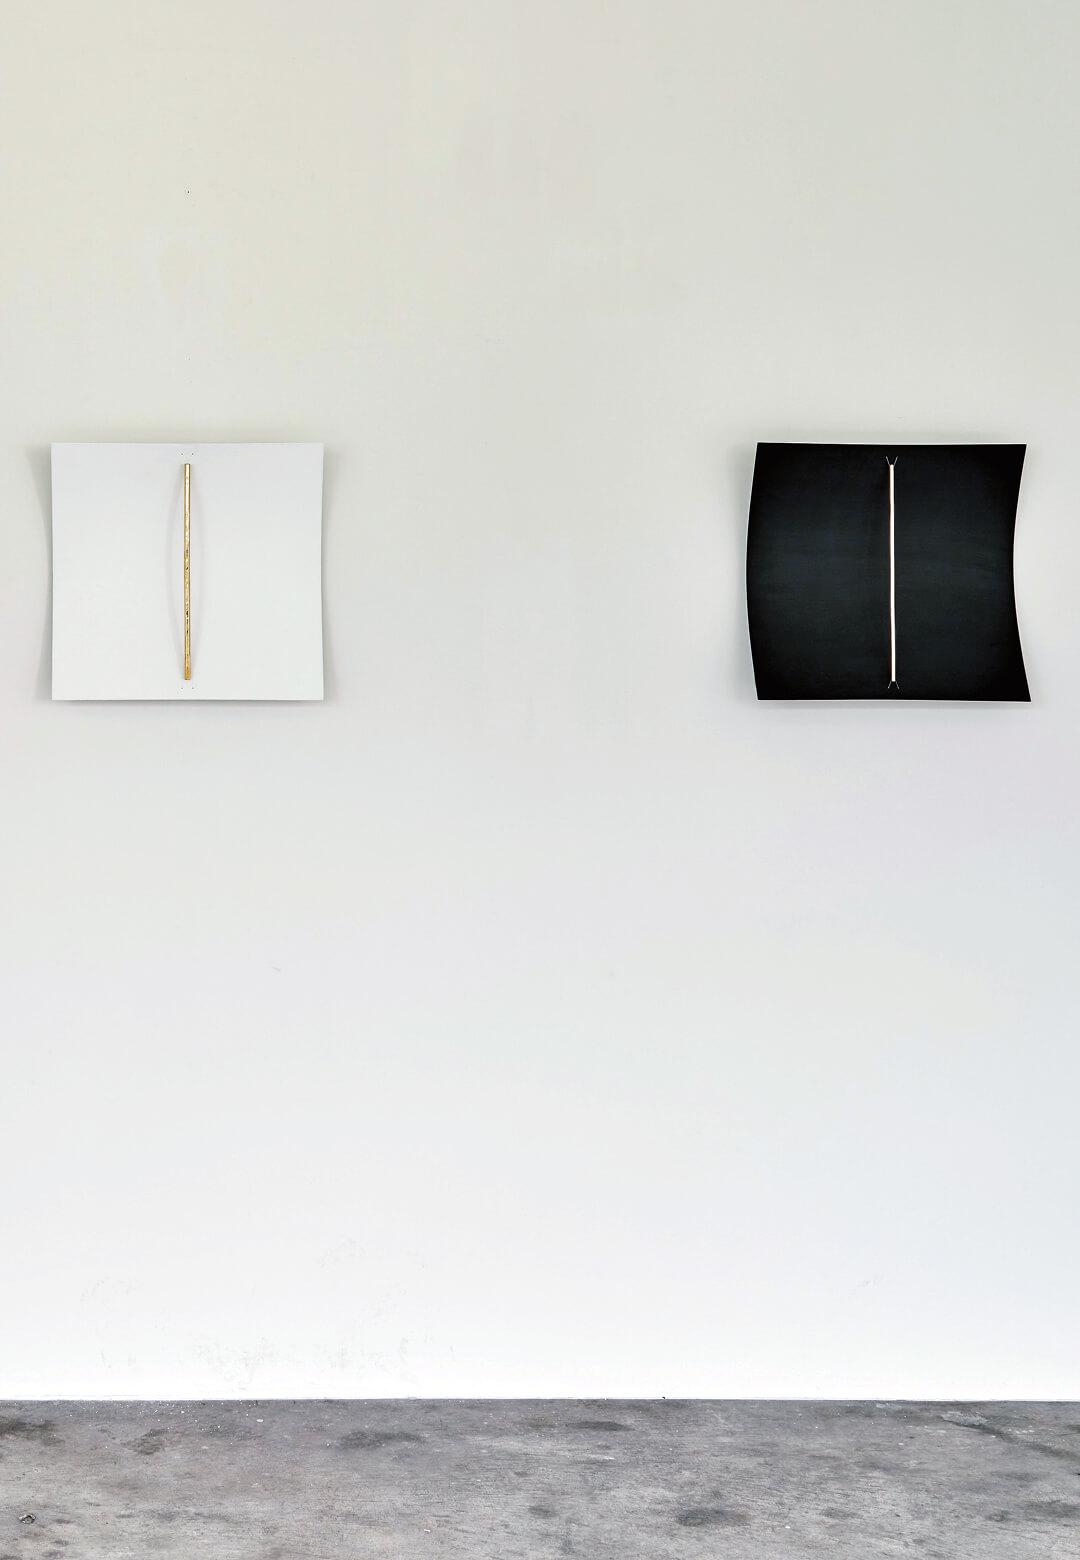 Resonance by Germaine Kruip | STIRworld